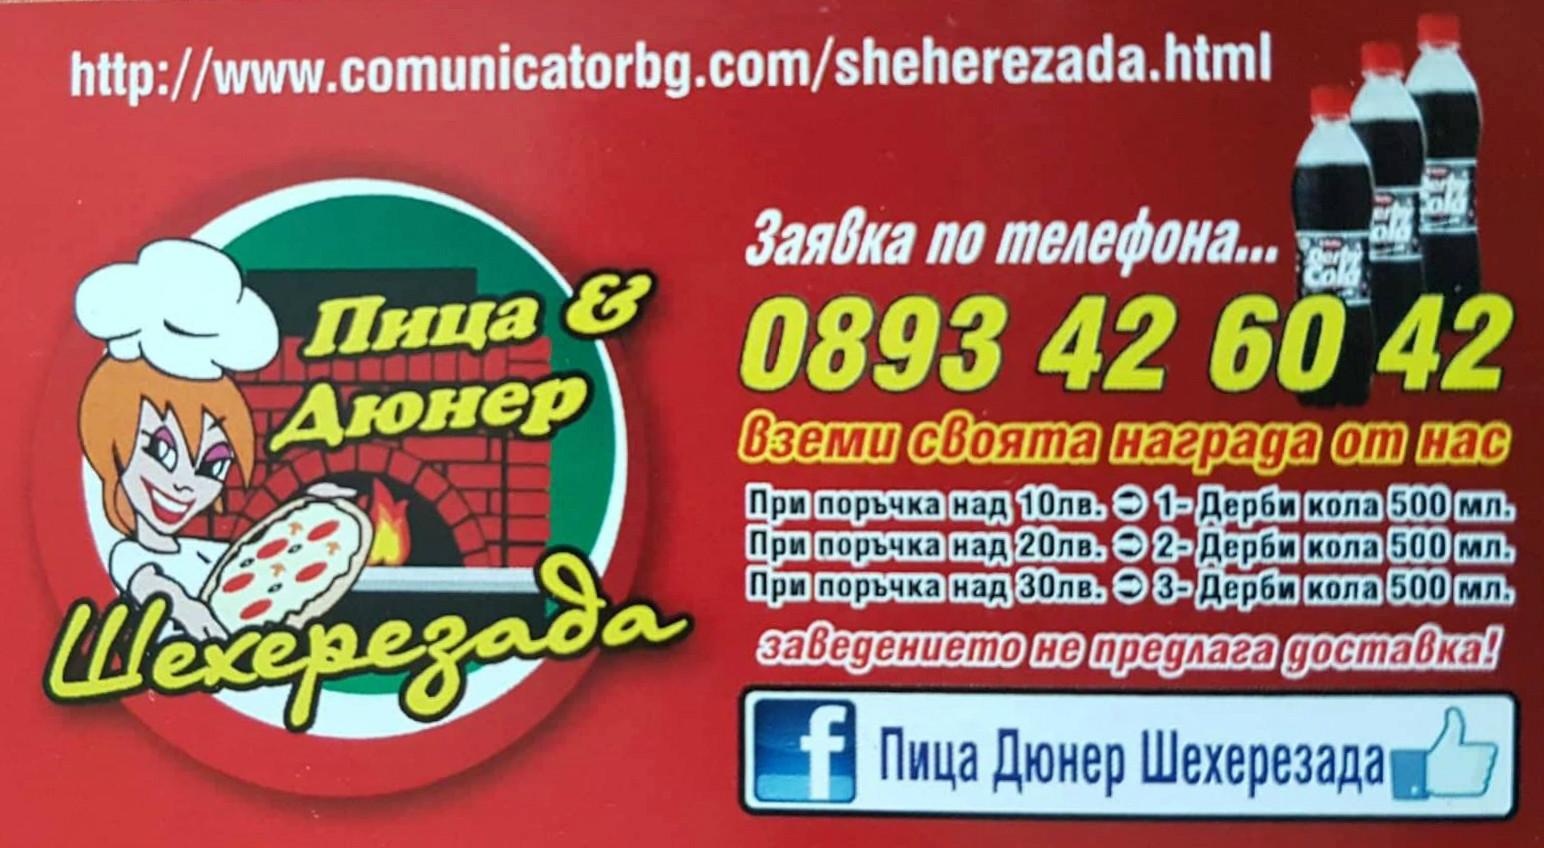 пицария шехерезада